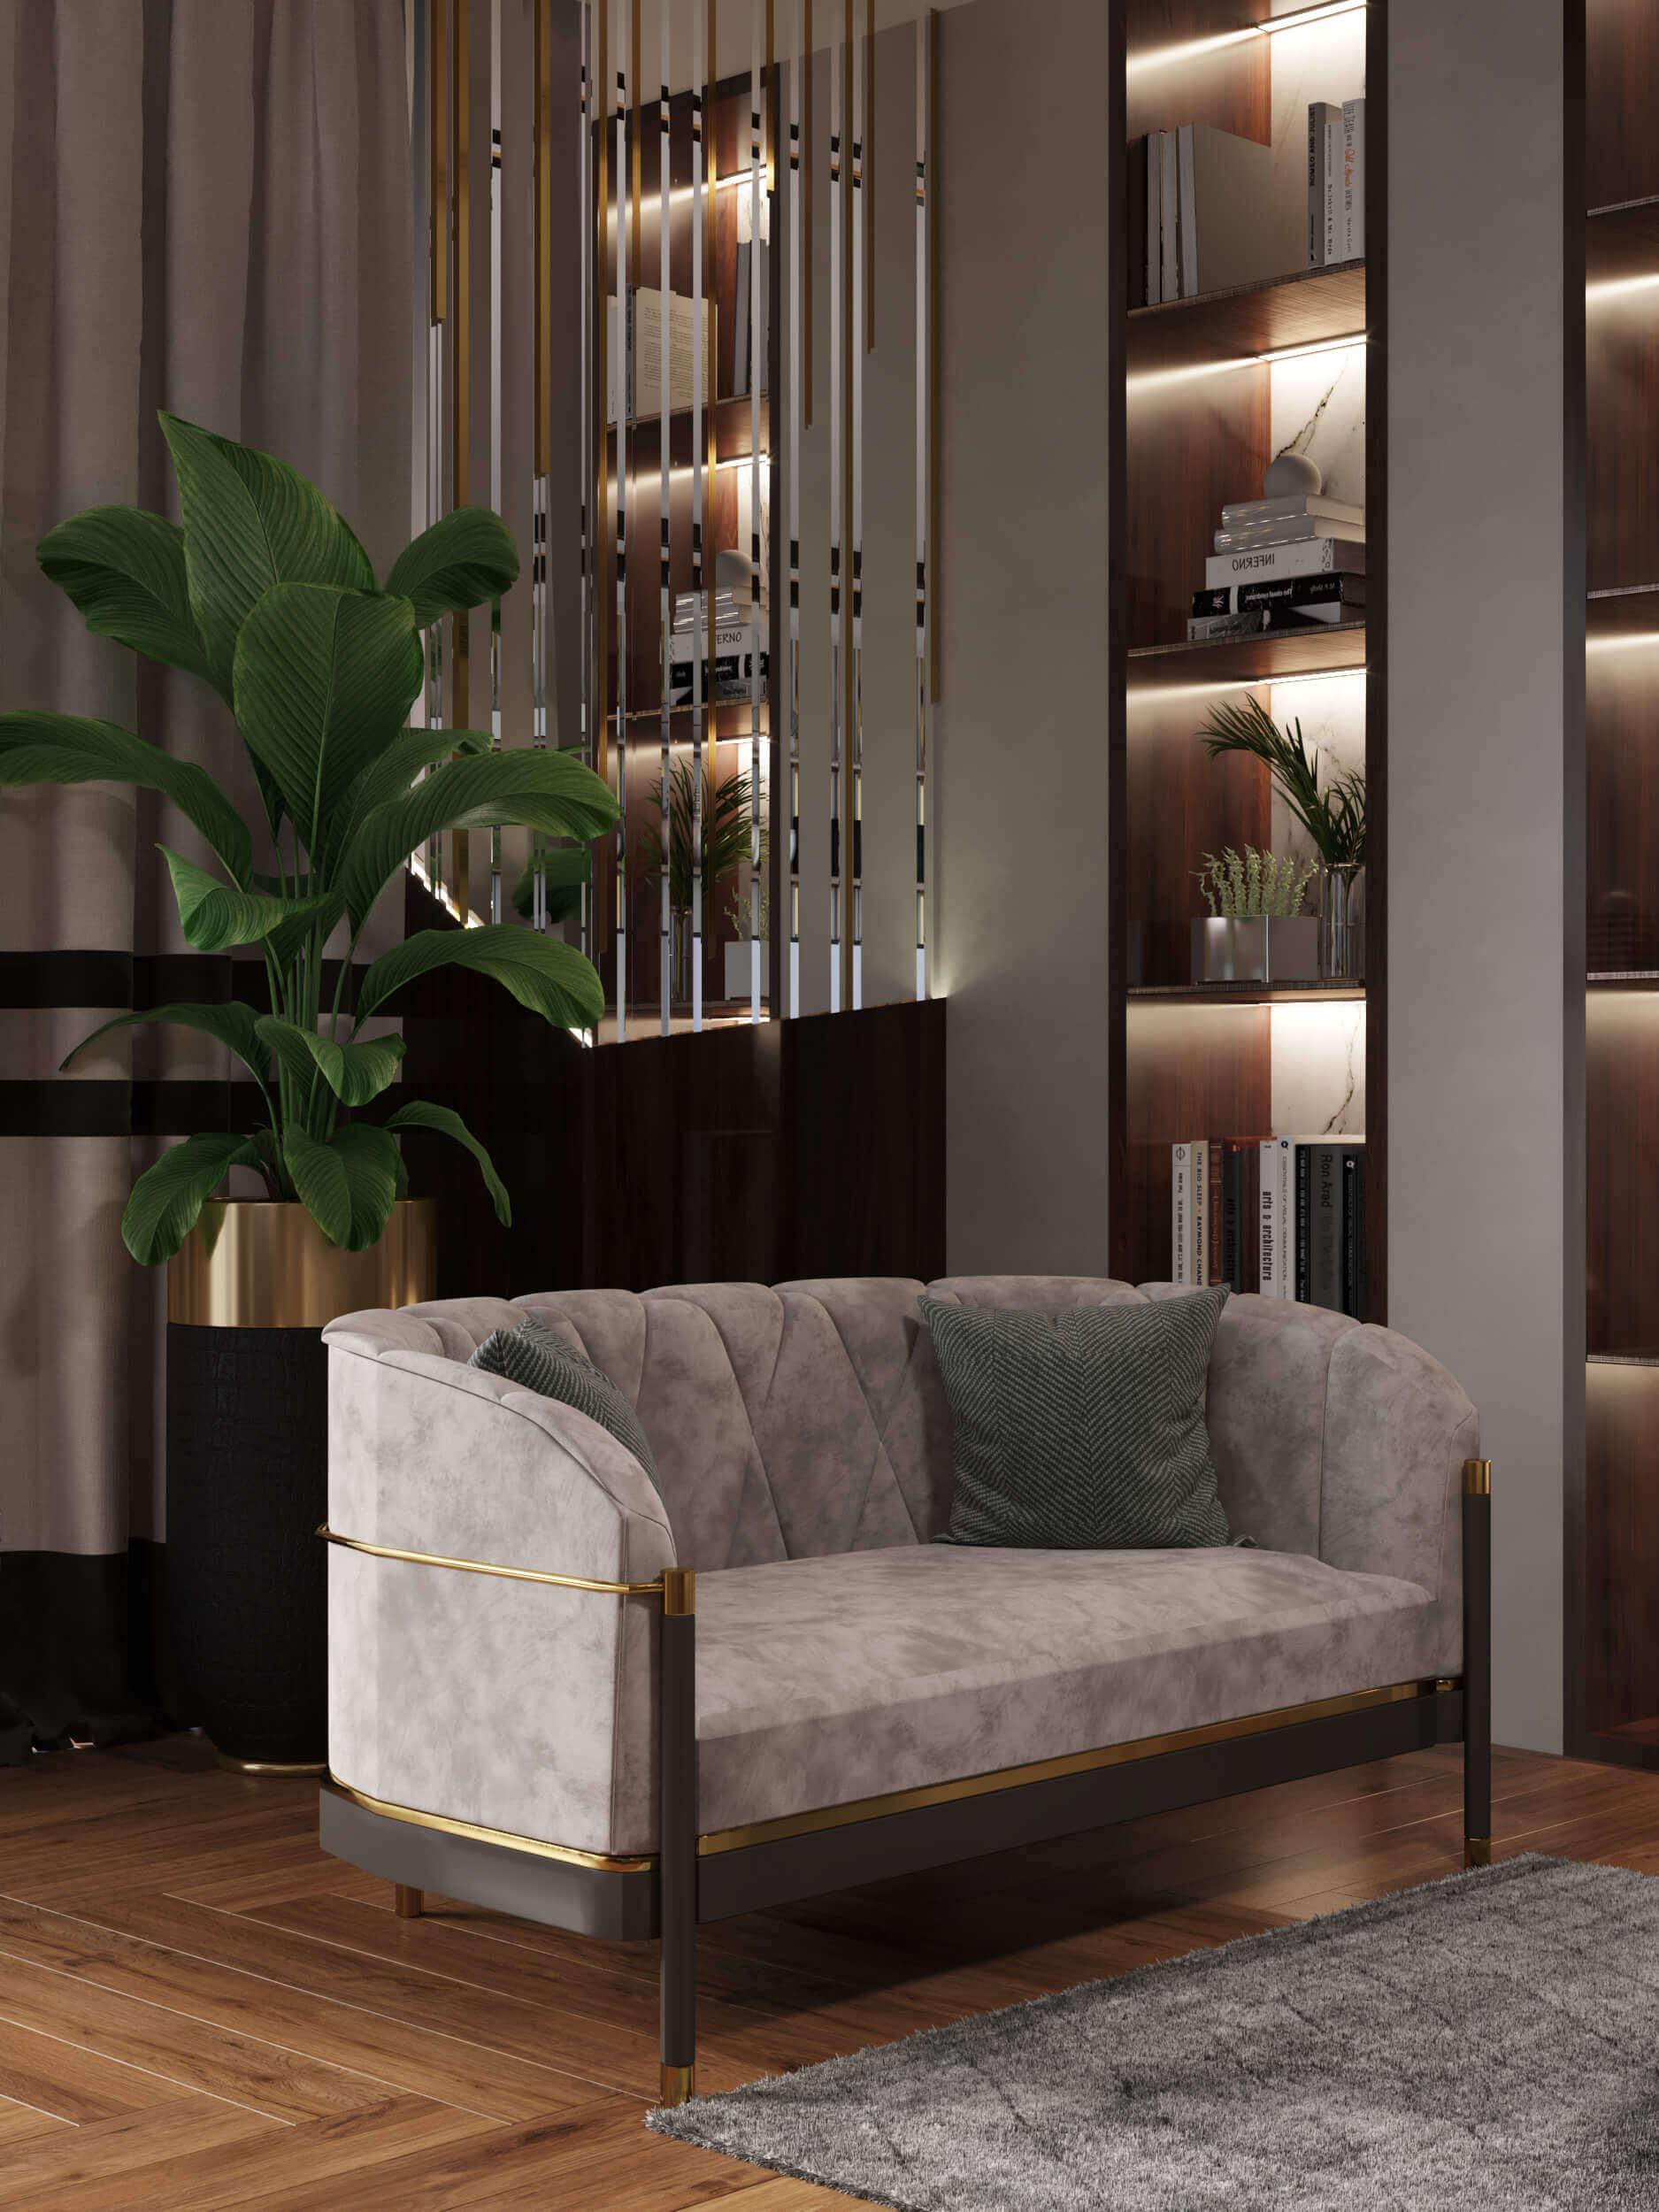 Natamam villa design 3951 TS Apartment Residential